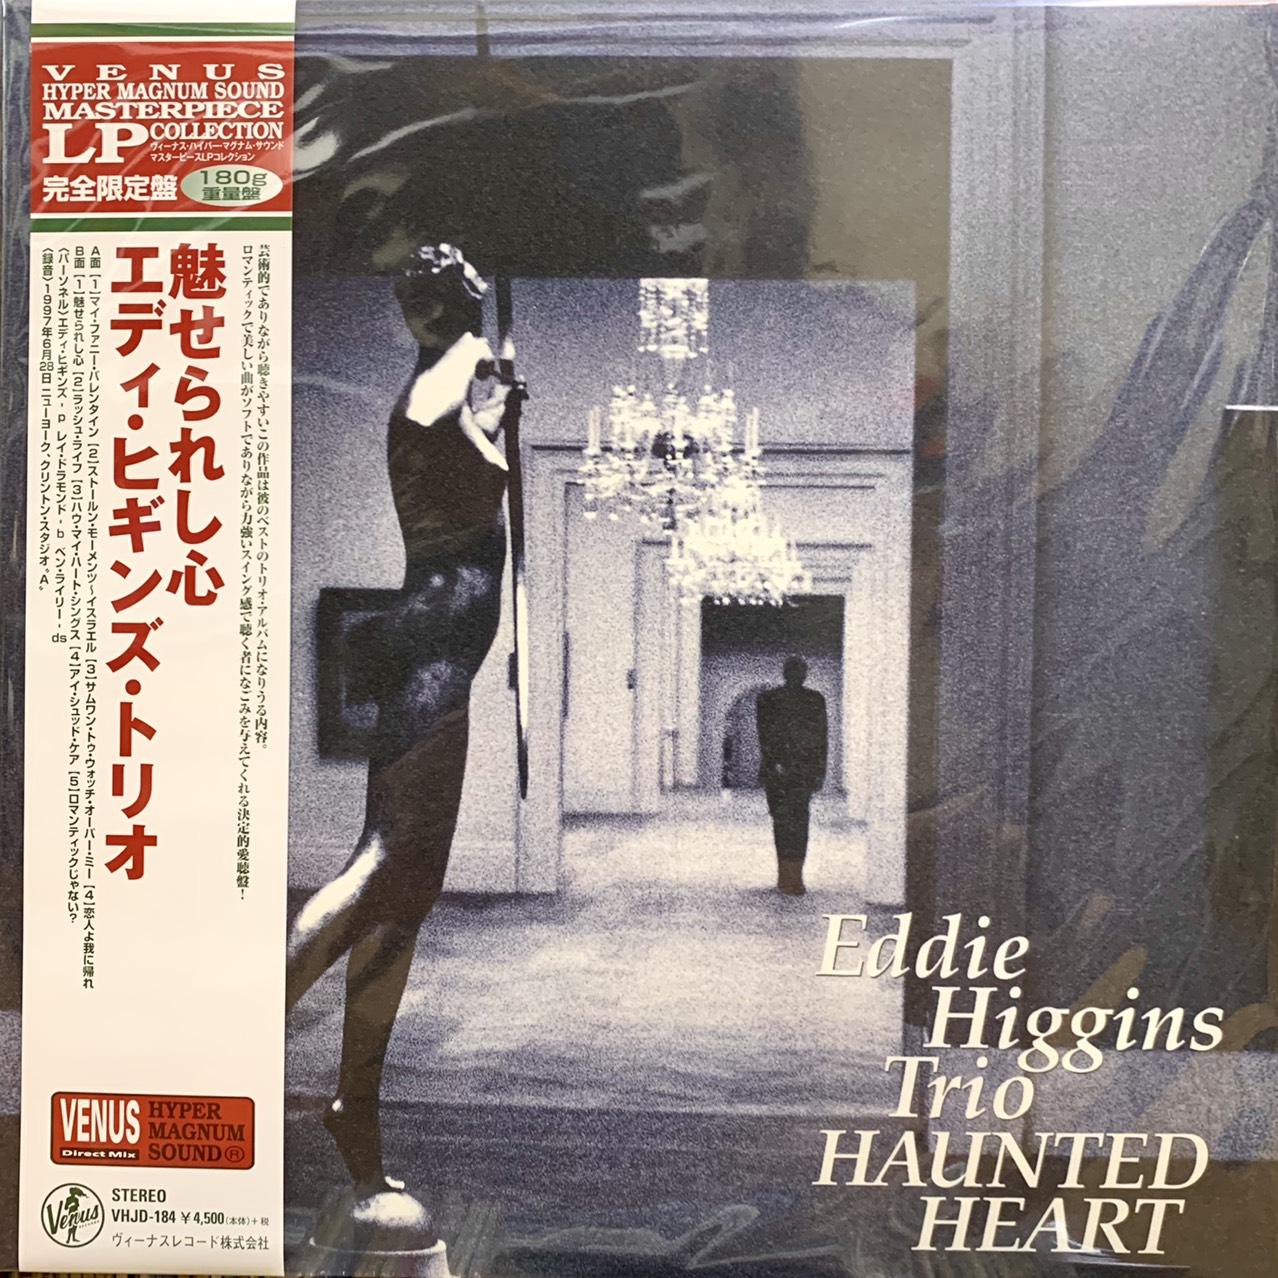 dia-than-vinyl-eddie-higgins-trio-haunter-heart